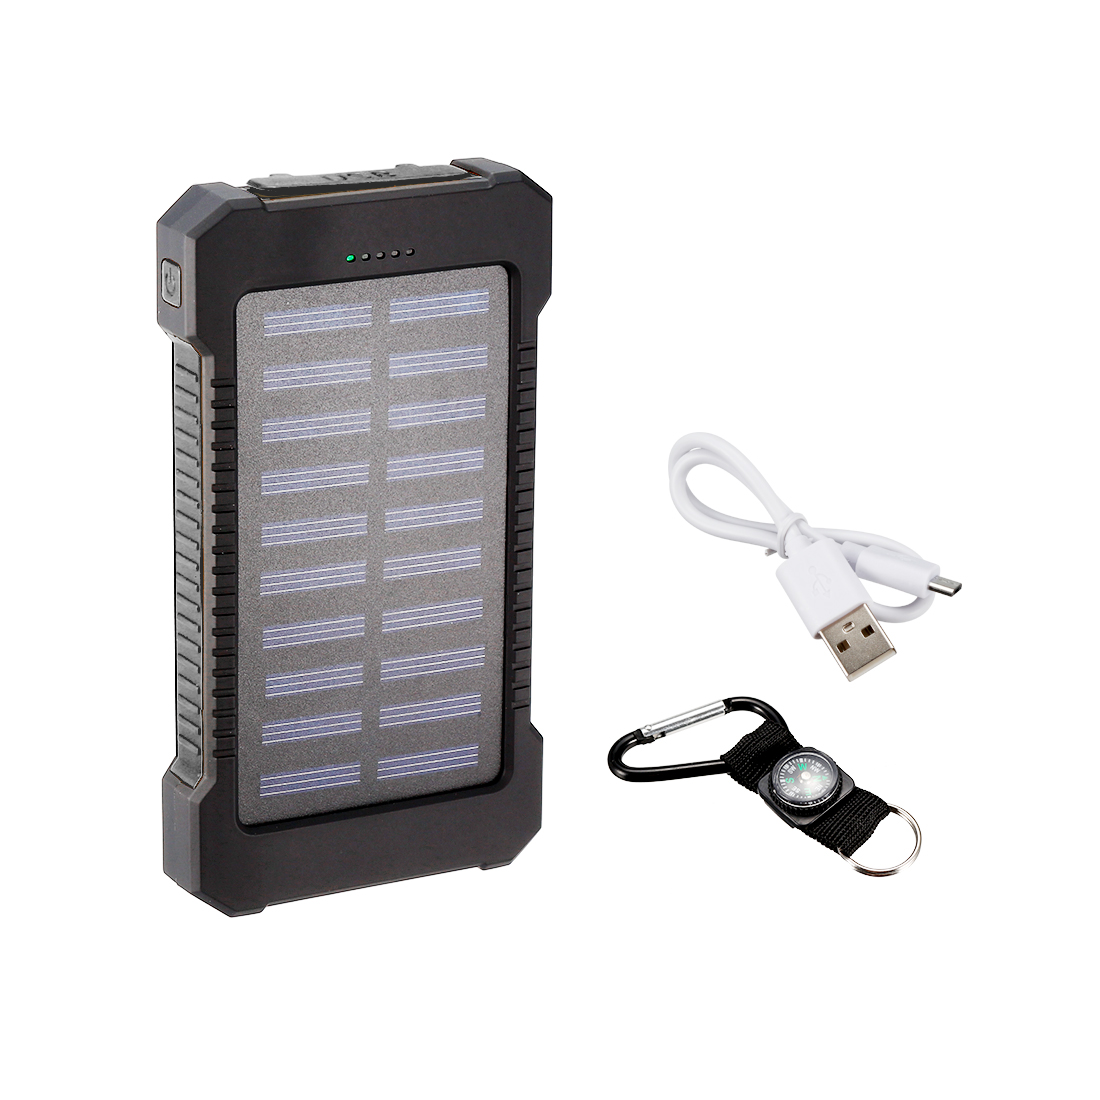 1.2W 8000mAh Solar Charger Dual USB Power Bank Phone Battery Flashlight Black